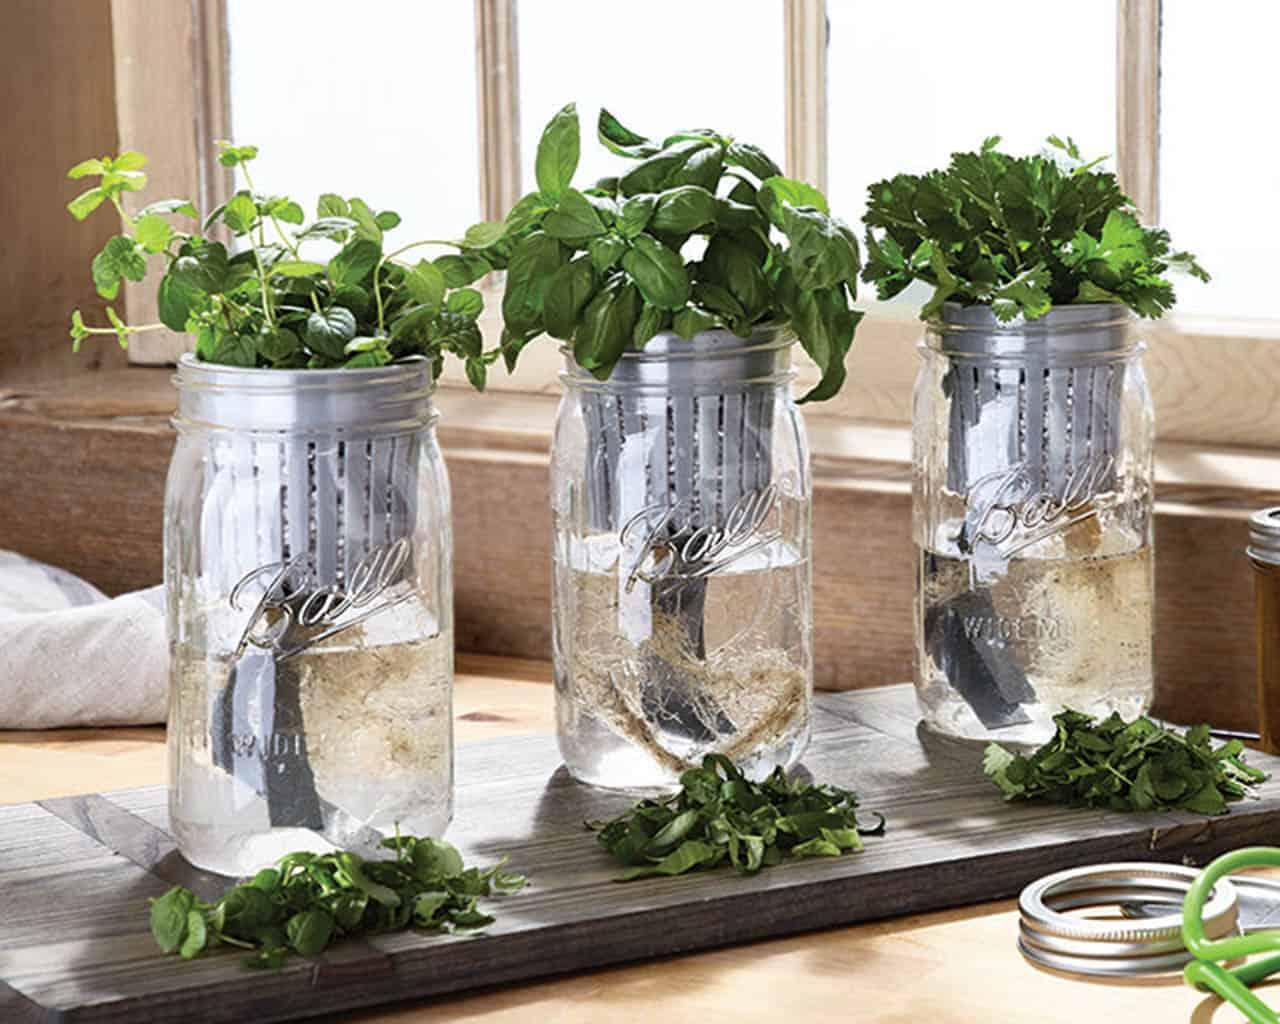 Ball Herb Growing Kit Self Watering